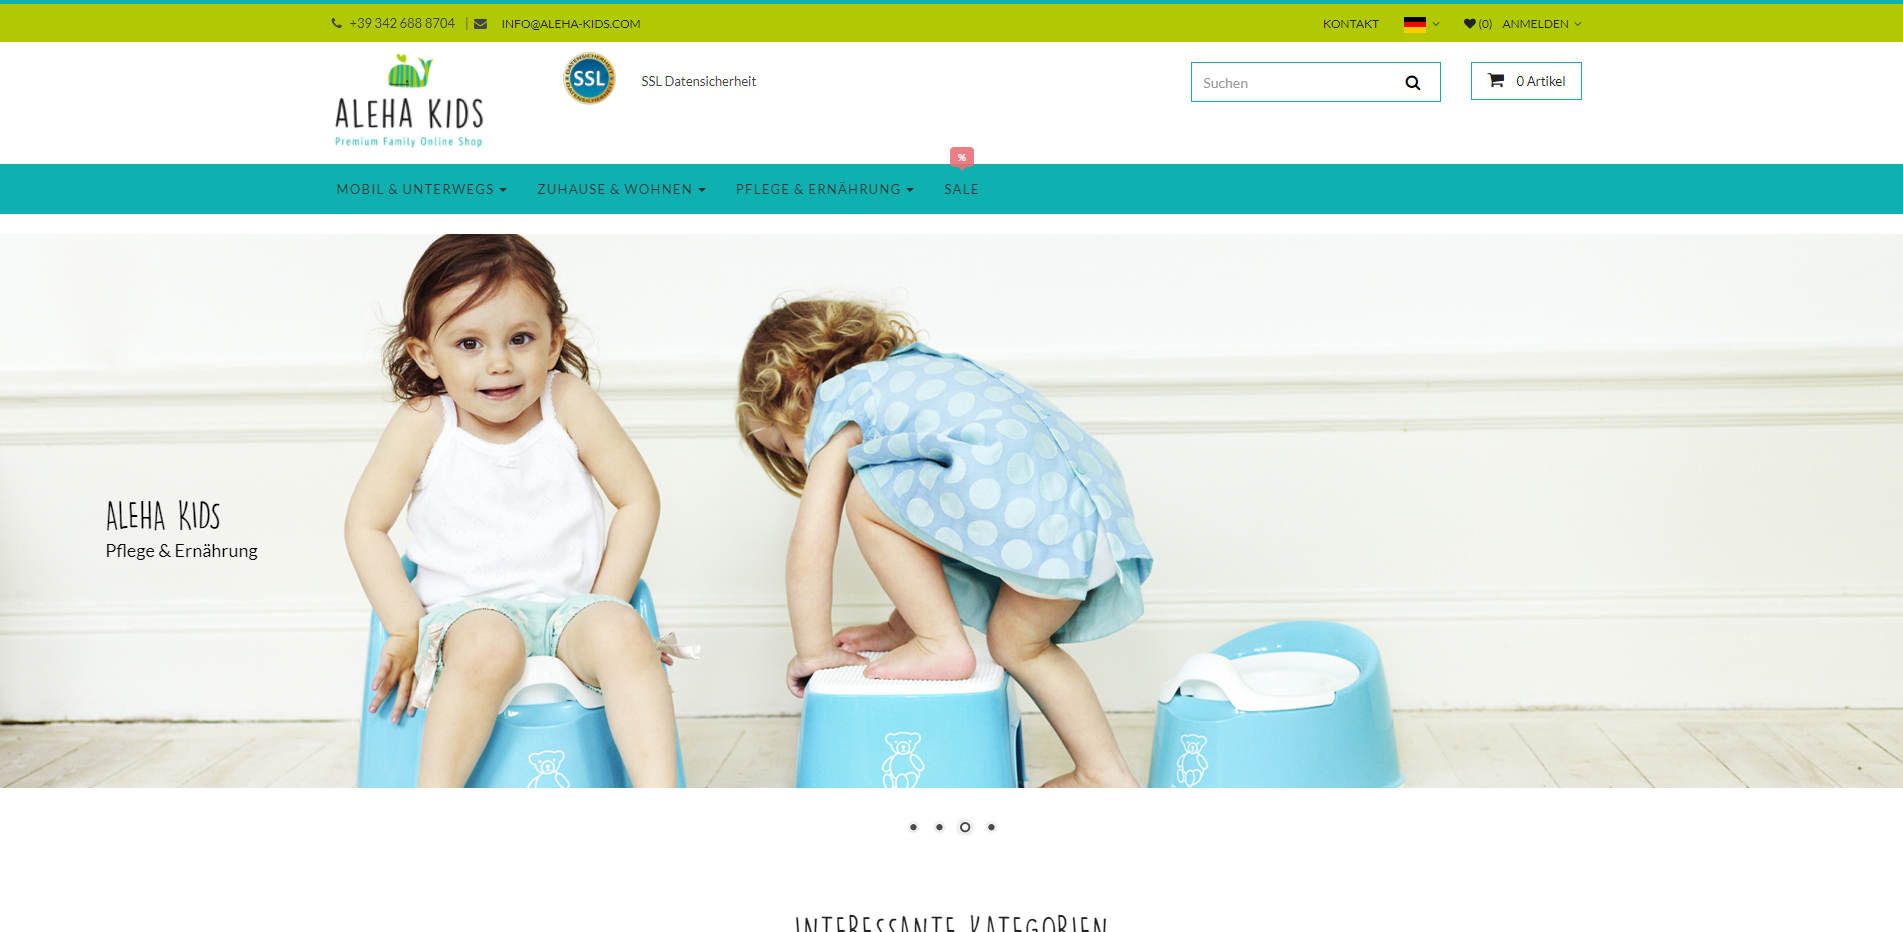 aleha-kids.com